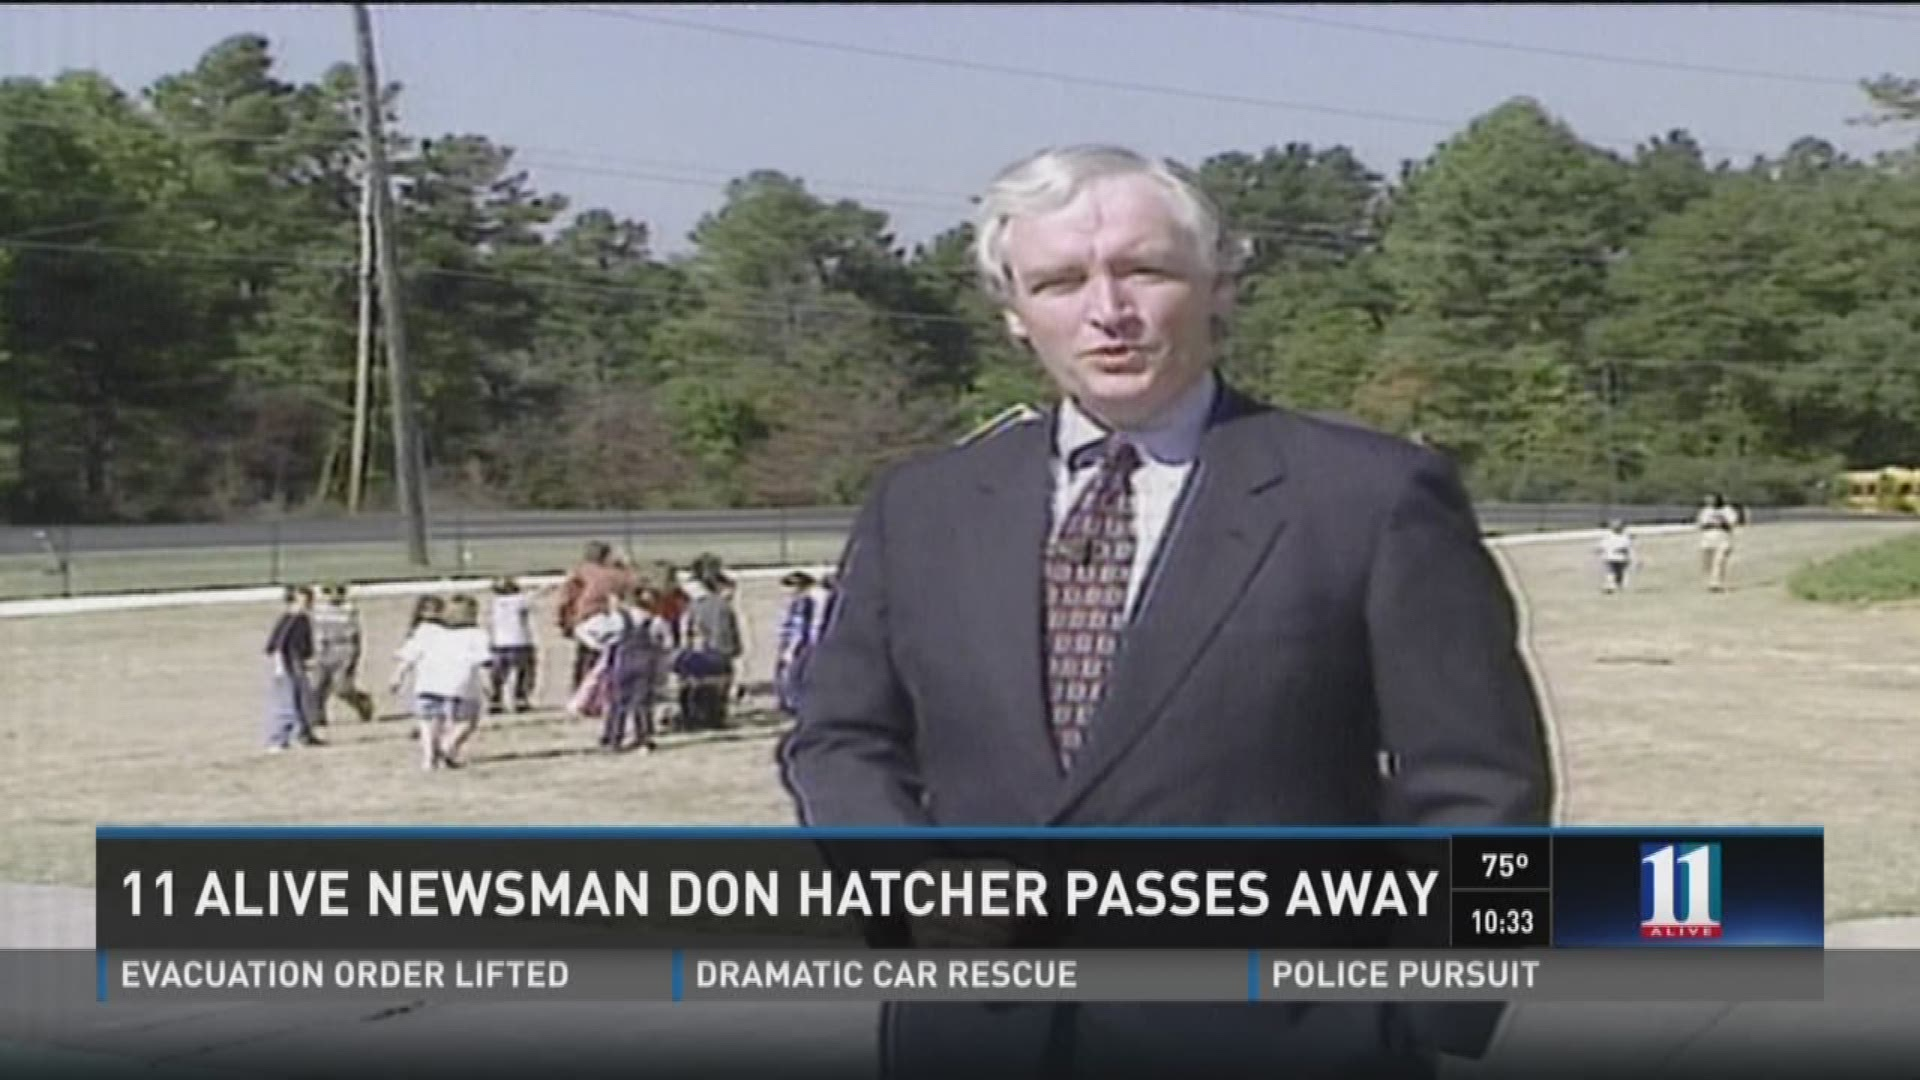 11Alive newsman Don Hatcher passes away